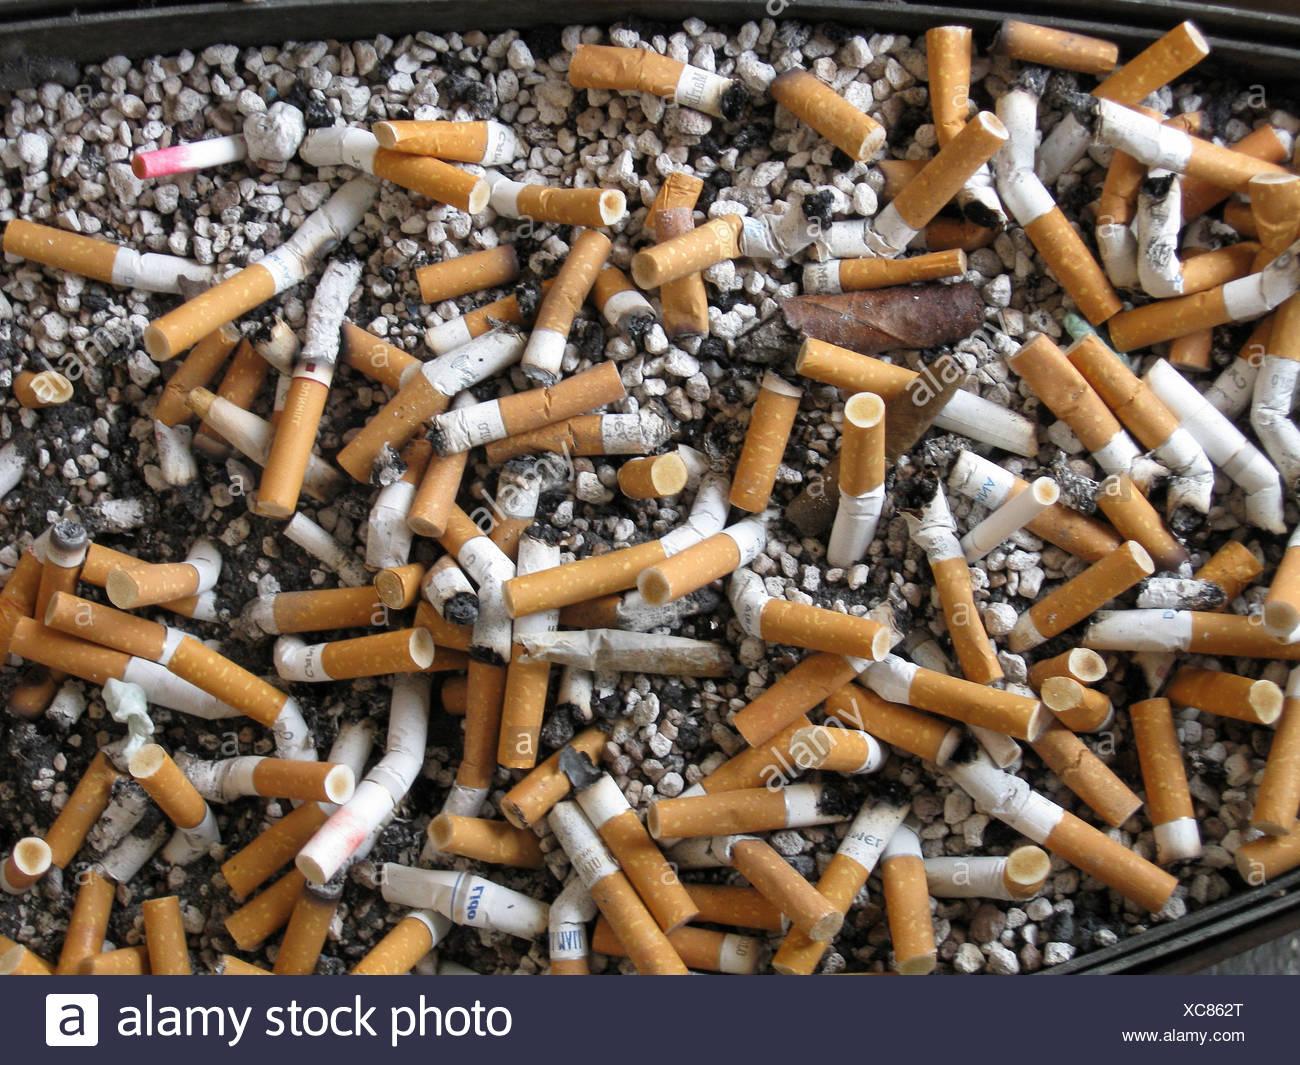 habit cigarette cigar butts ashtray smoking health hazard cigarettes - Stock Image